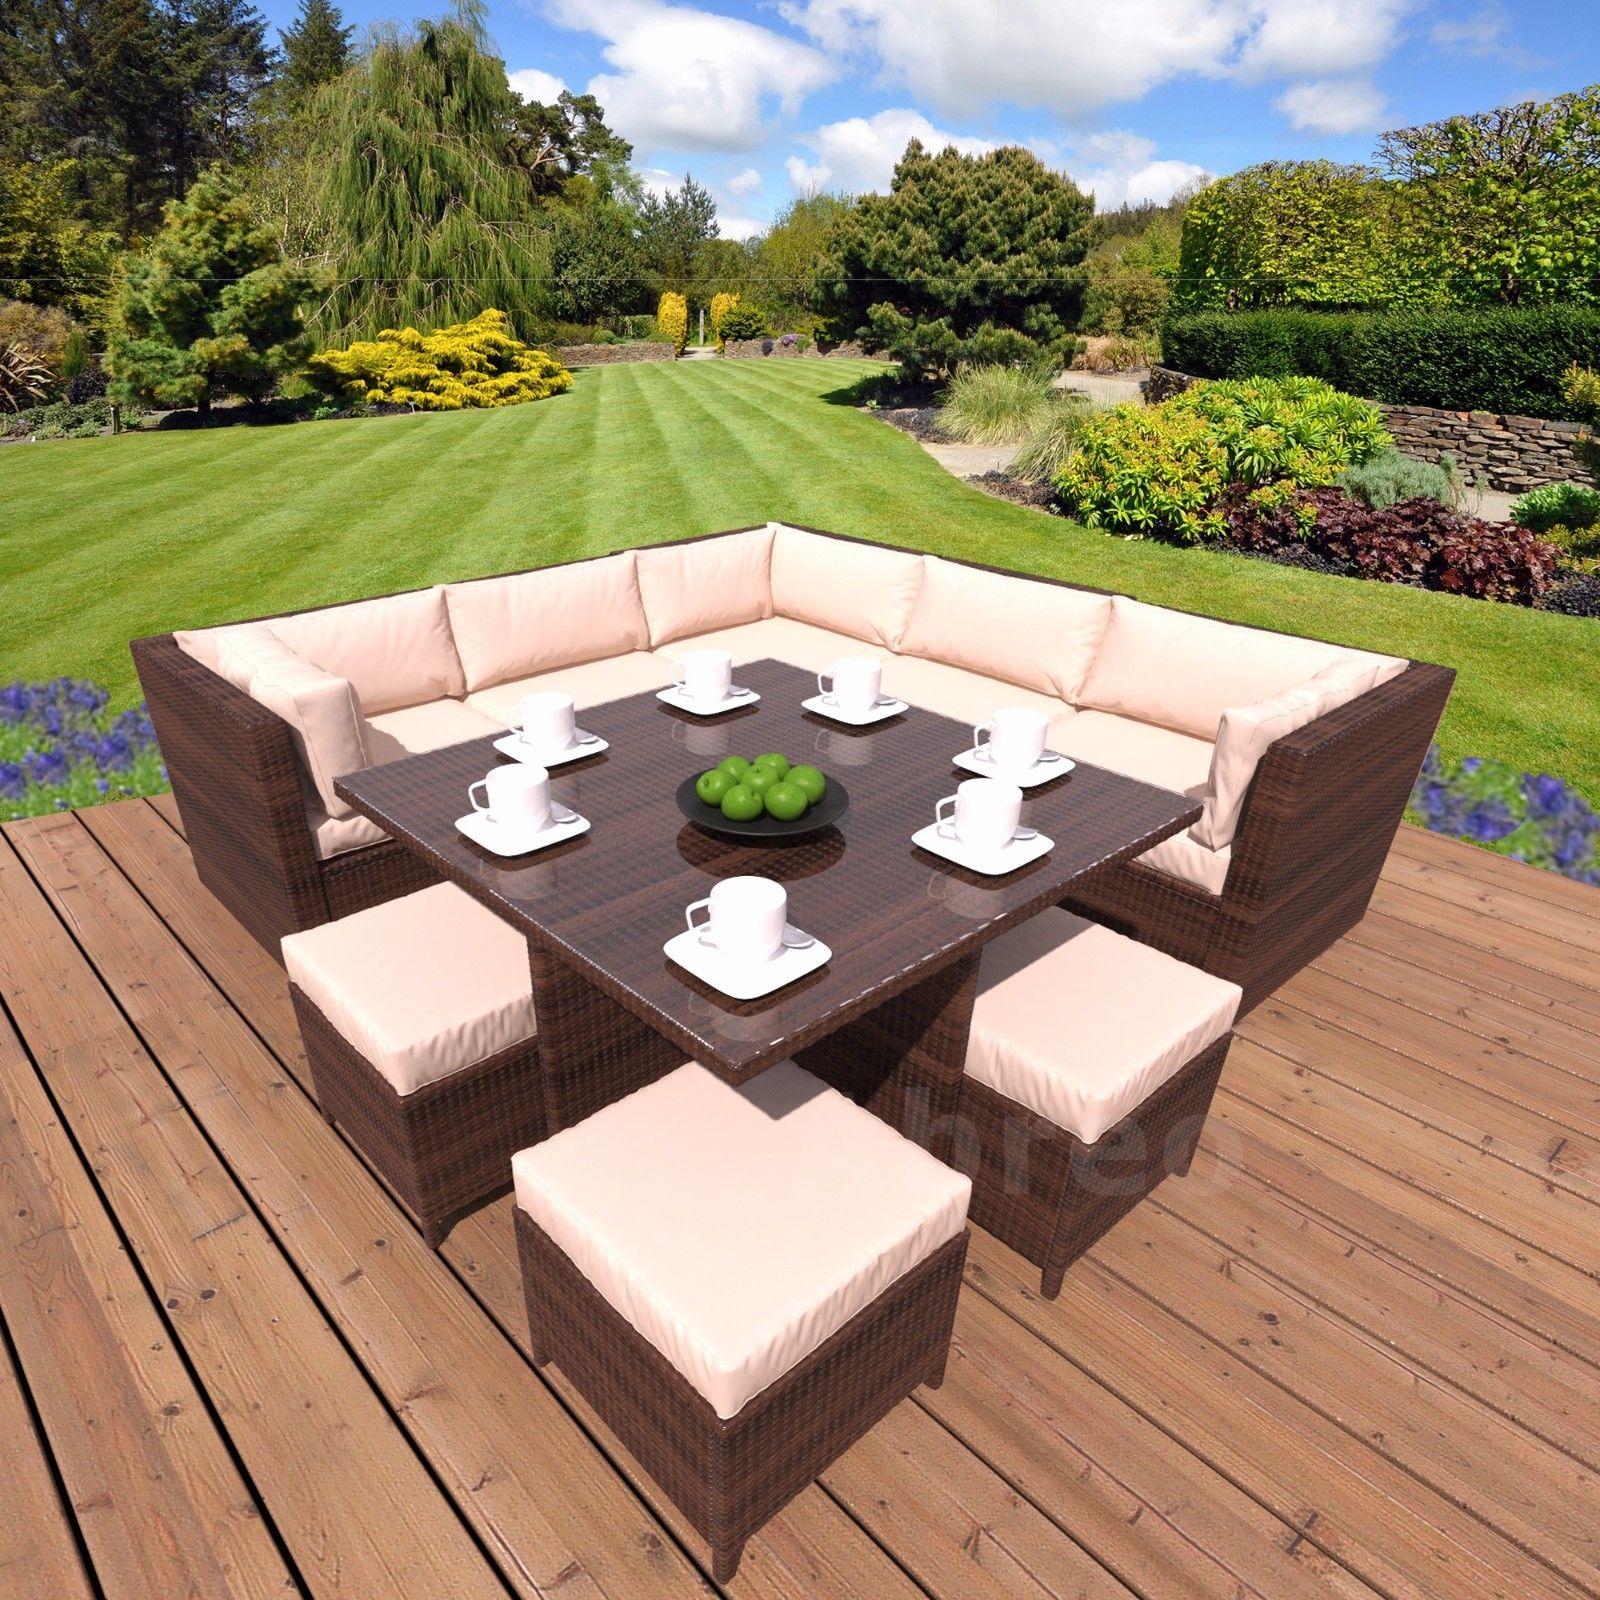 Modular Rattan Garden Furnishings Cube Nook Sofa Footstool Consuming Desk Set